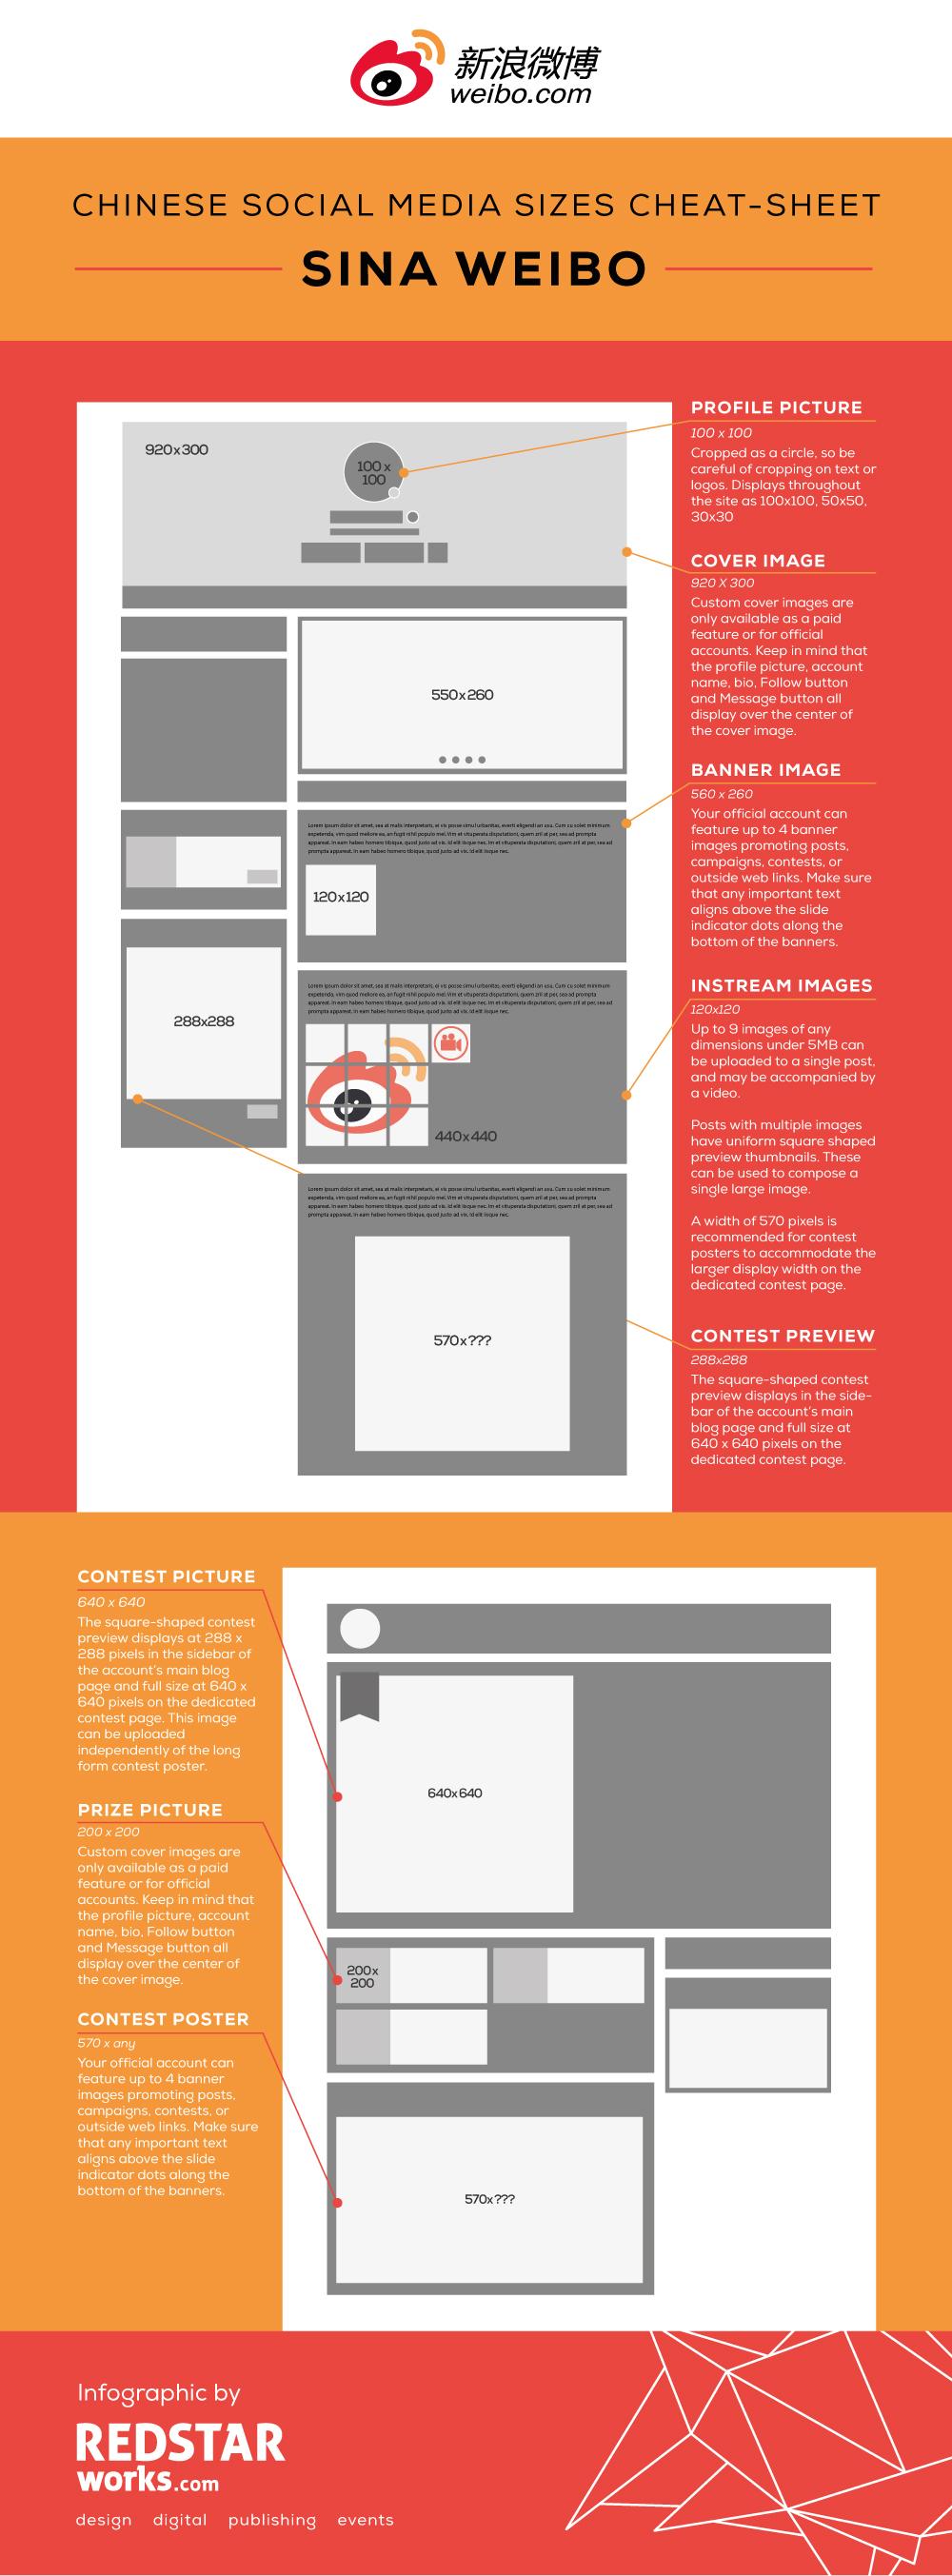 Weibo Social Media Cheat Sheet Redstar Works